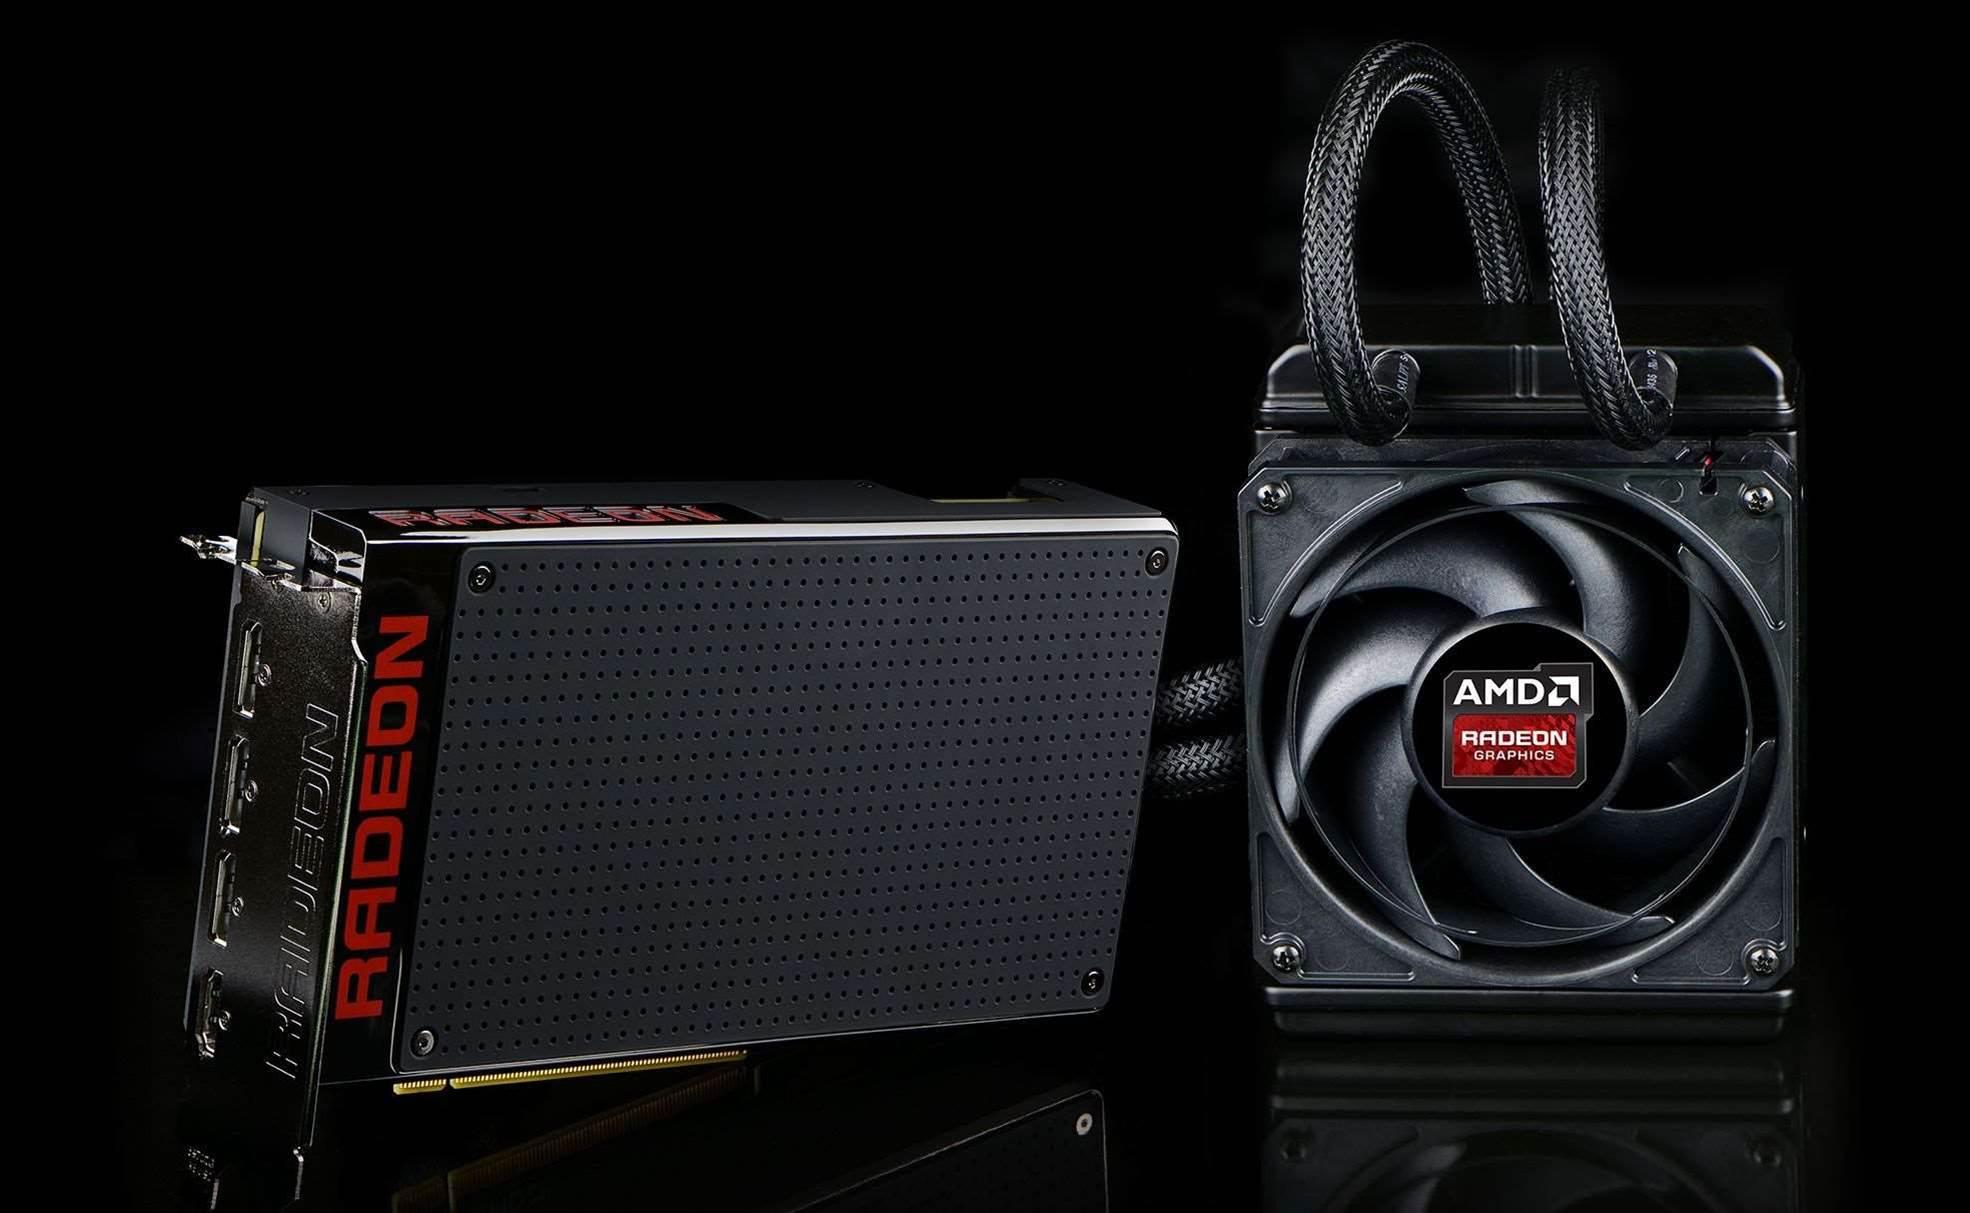 Review: AMD Radeon R9 Fury X